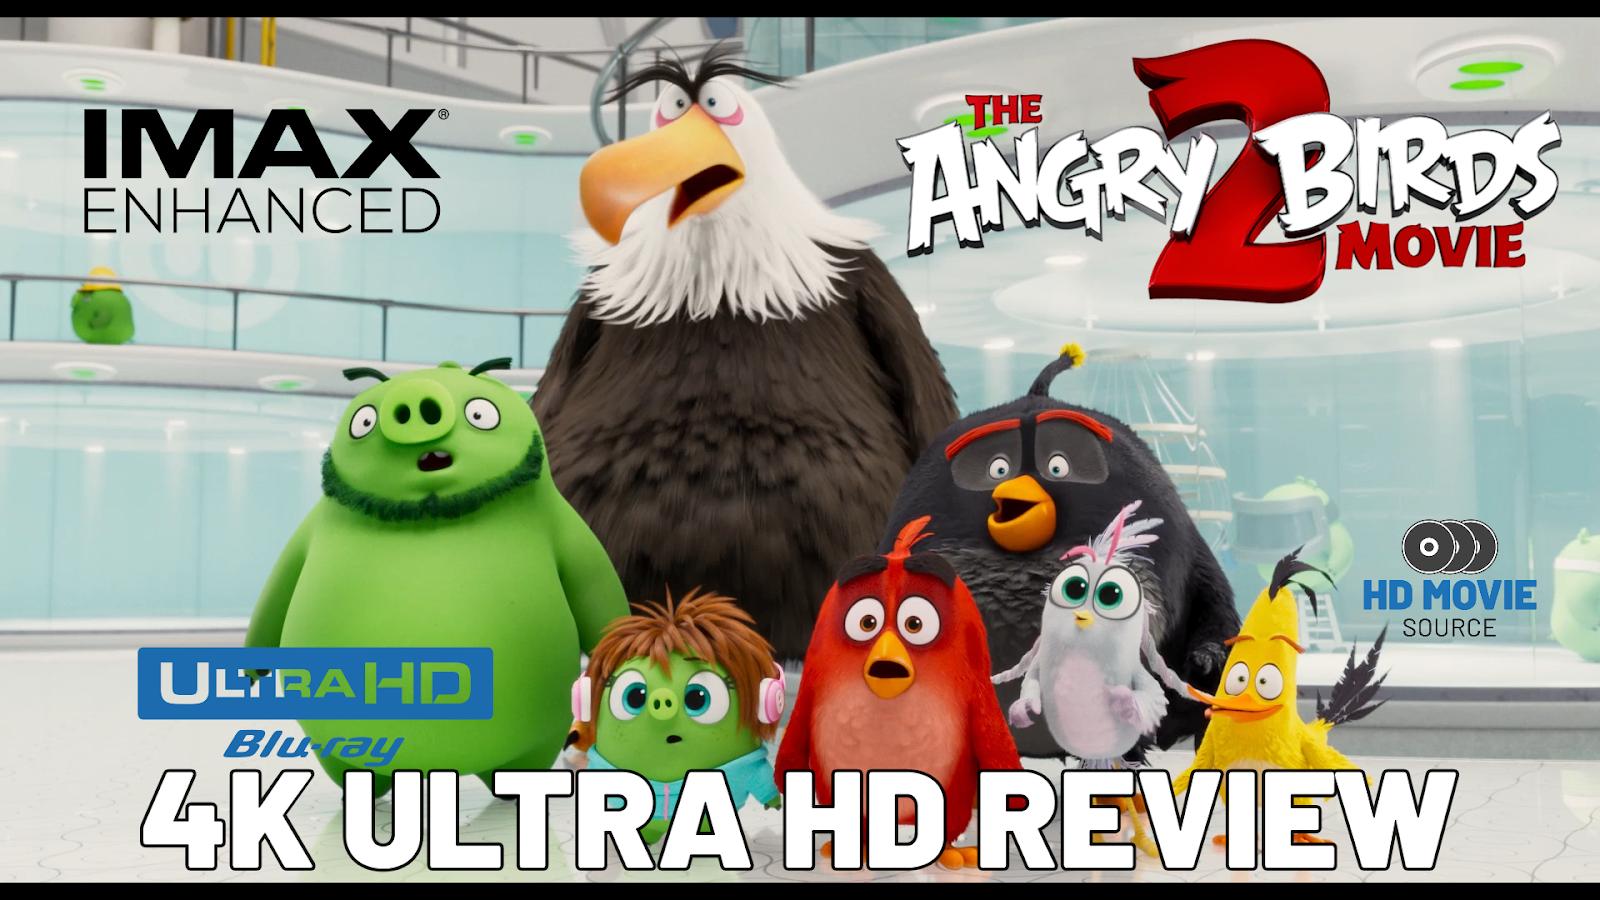 The Angry Birds Movie 2 2019 Imax Enhanced 4k Ultra Hd Blu Ray